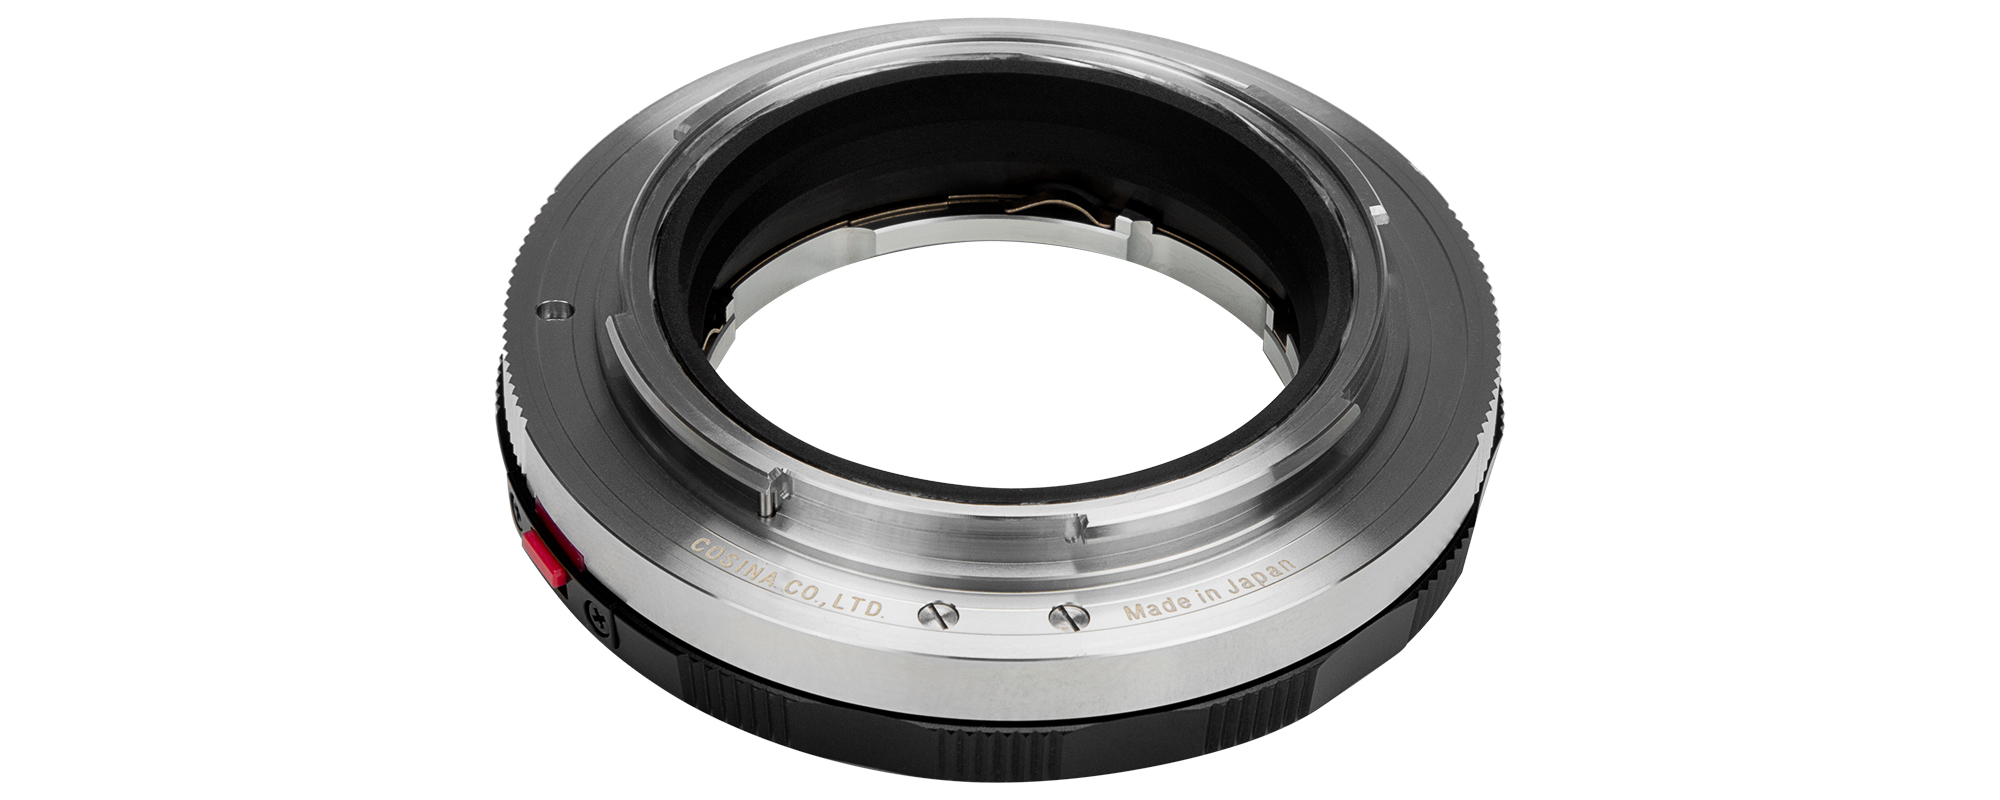 Adapter bagnetowy Voigtlander Close Focus Leica M _ Nikon Z widok mocowania Z